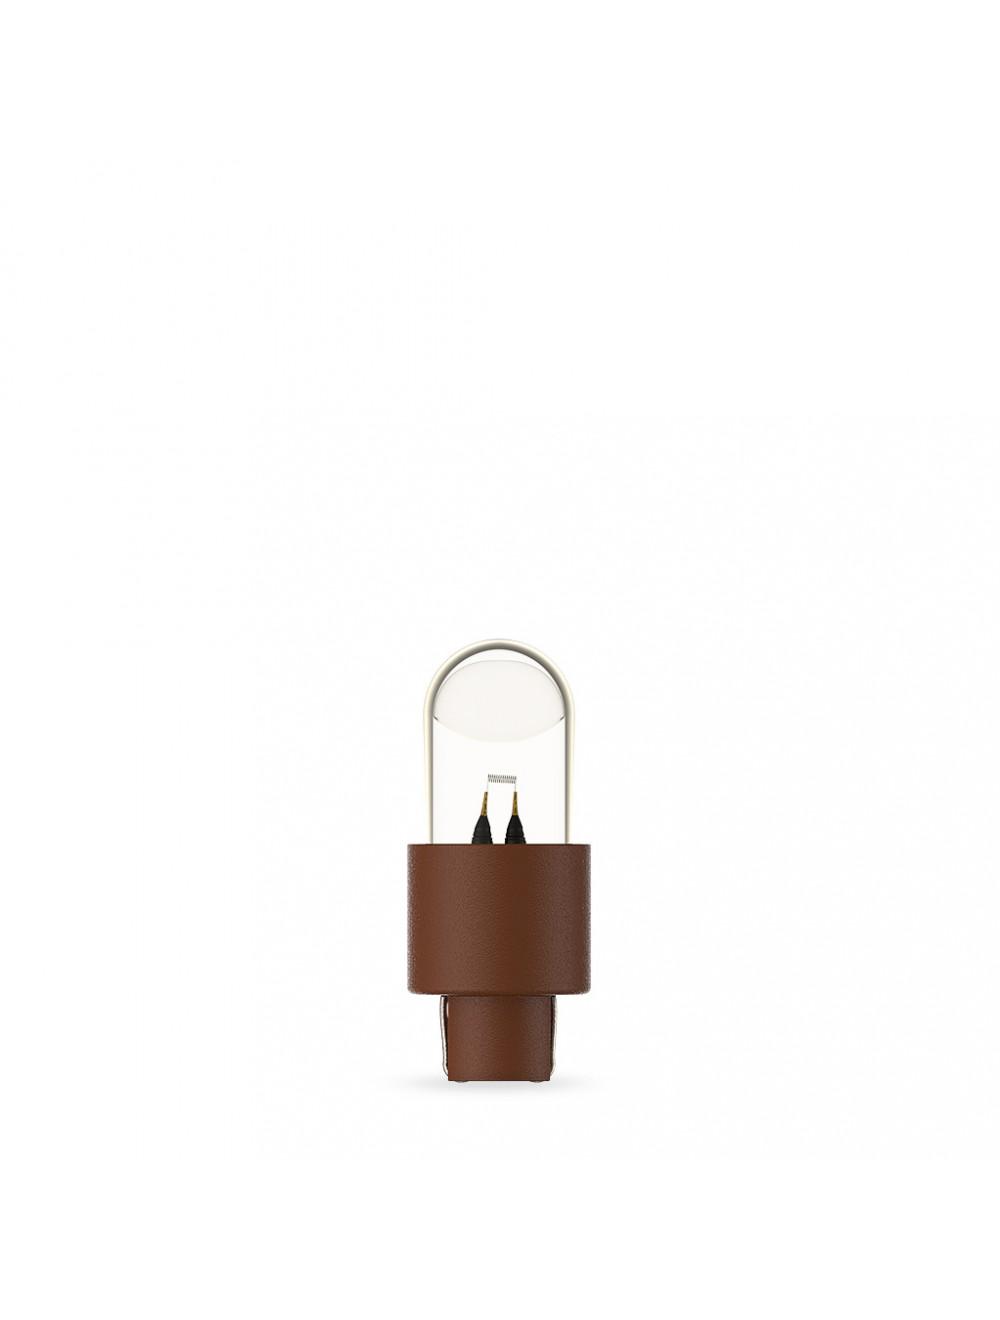 Das Produkt MK-dent Xenon Lampe BU7012SB aus dem Global-dent online shop.